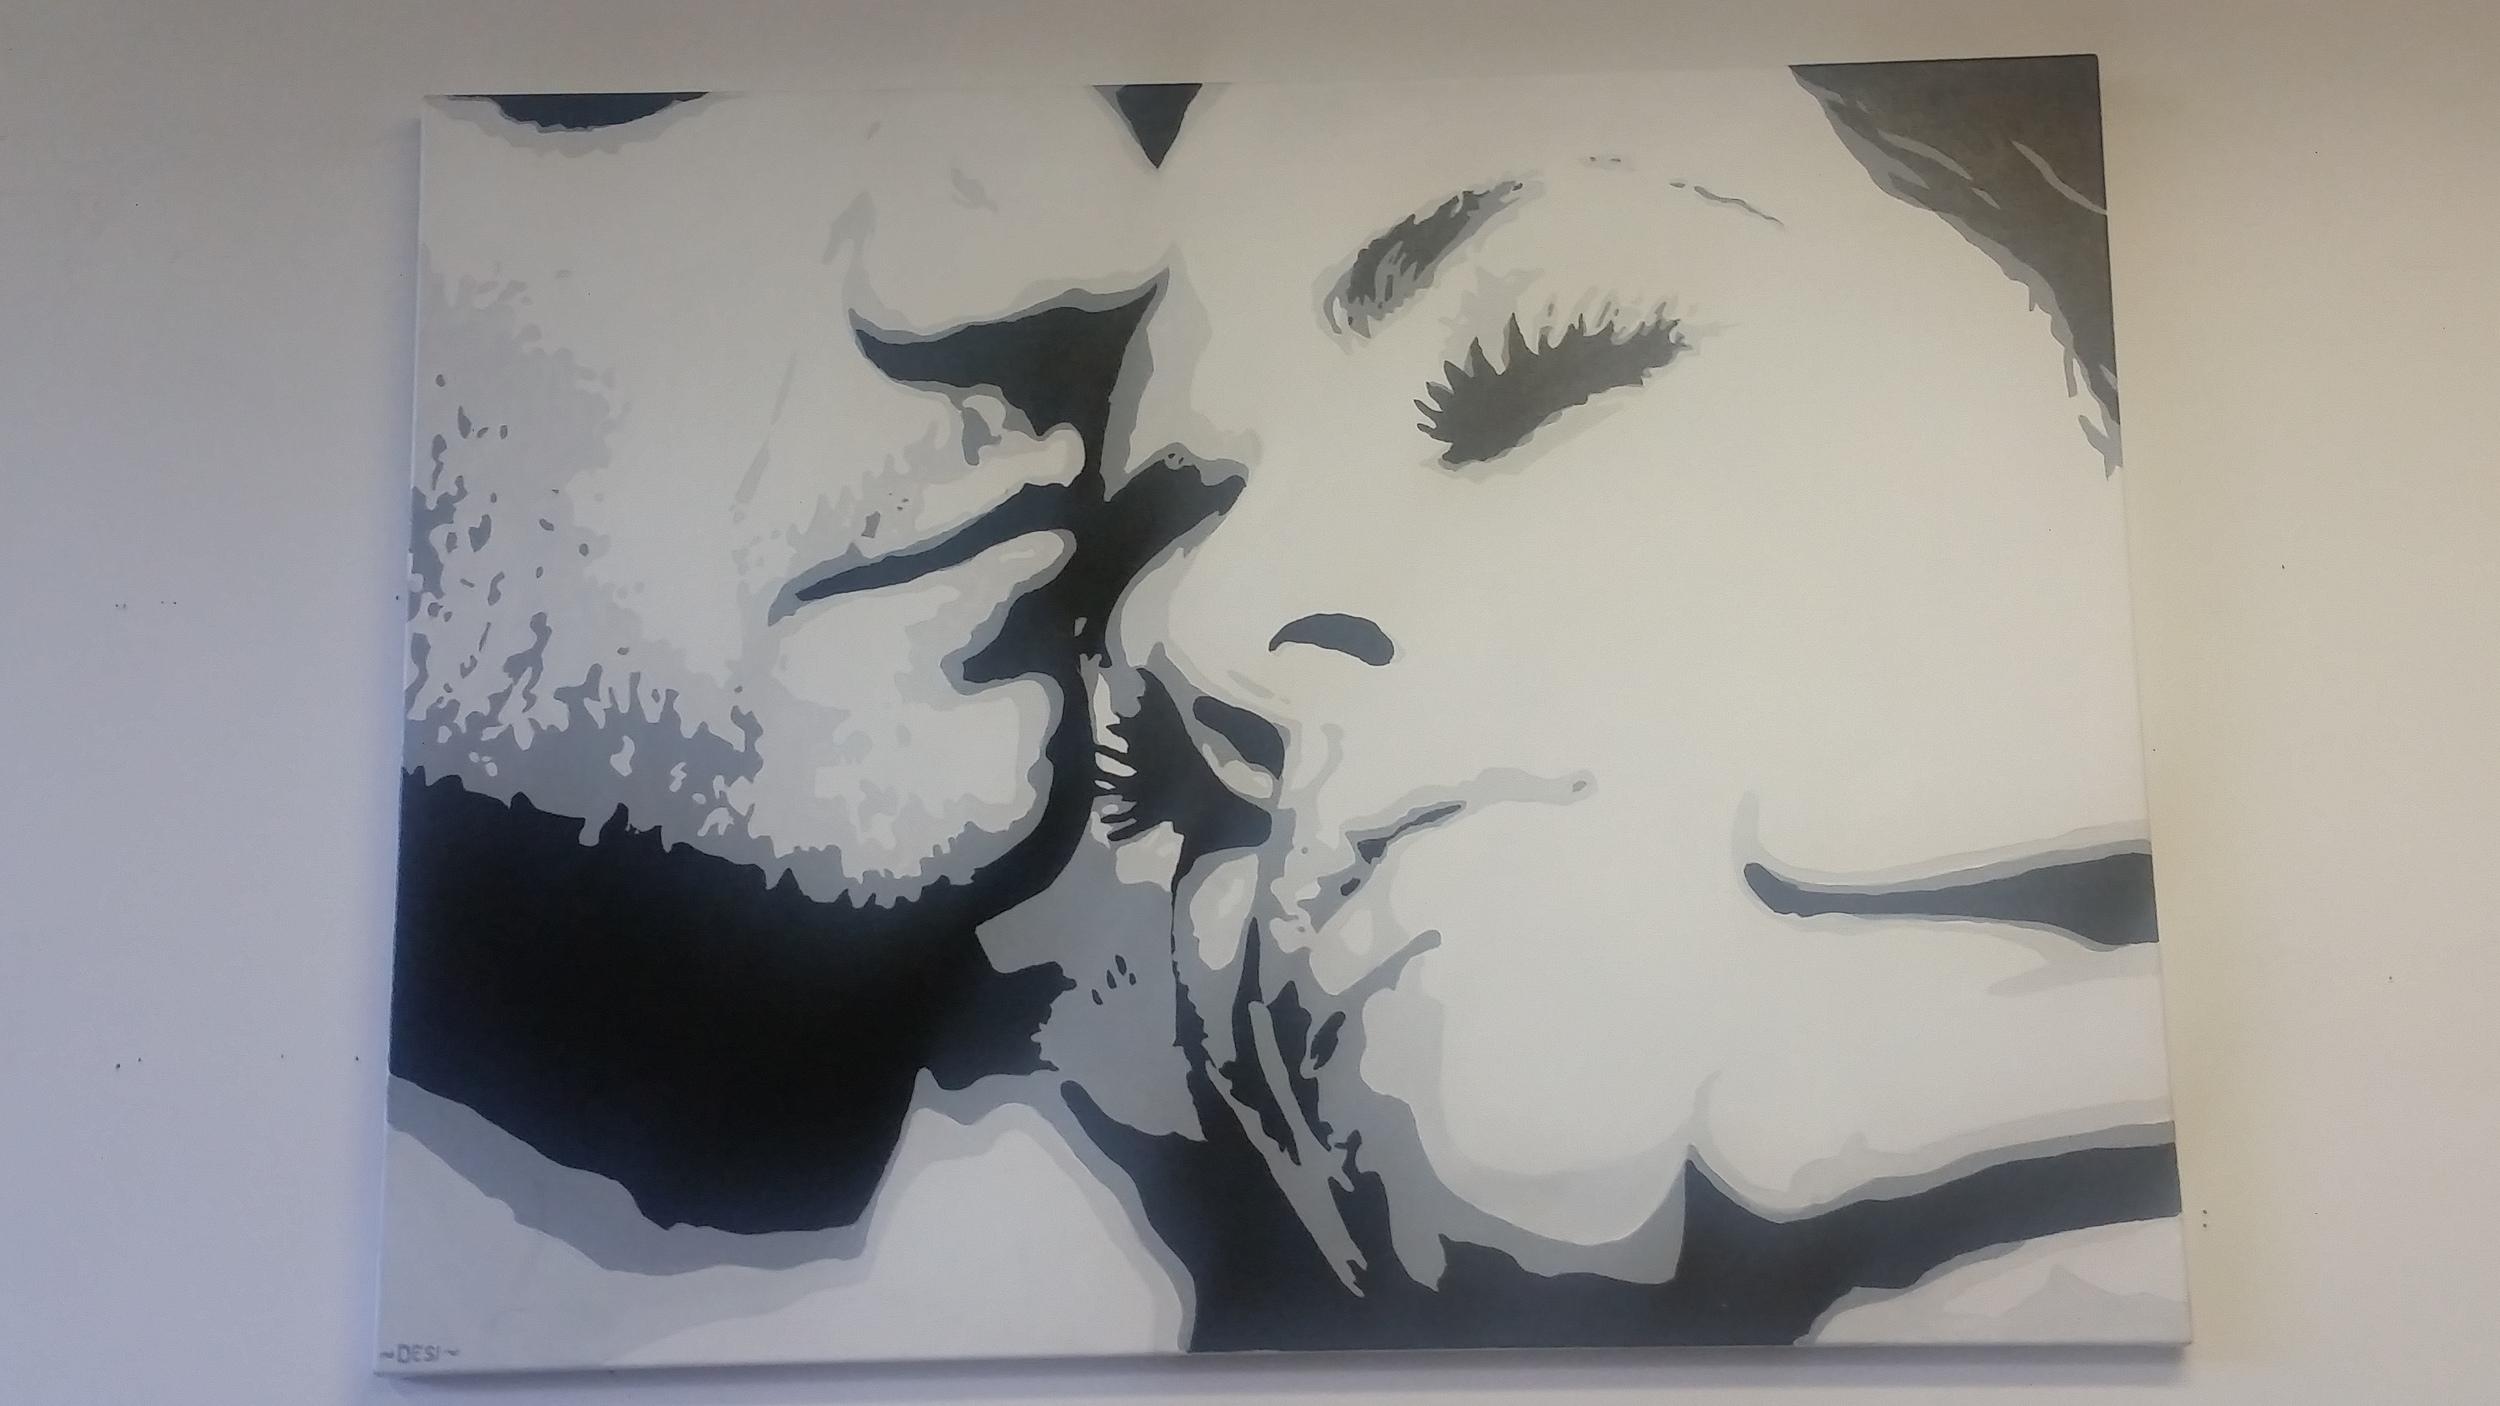 Artwork by Desiree Lichty.